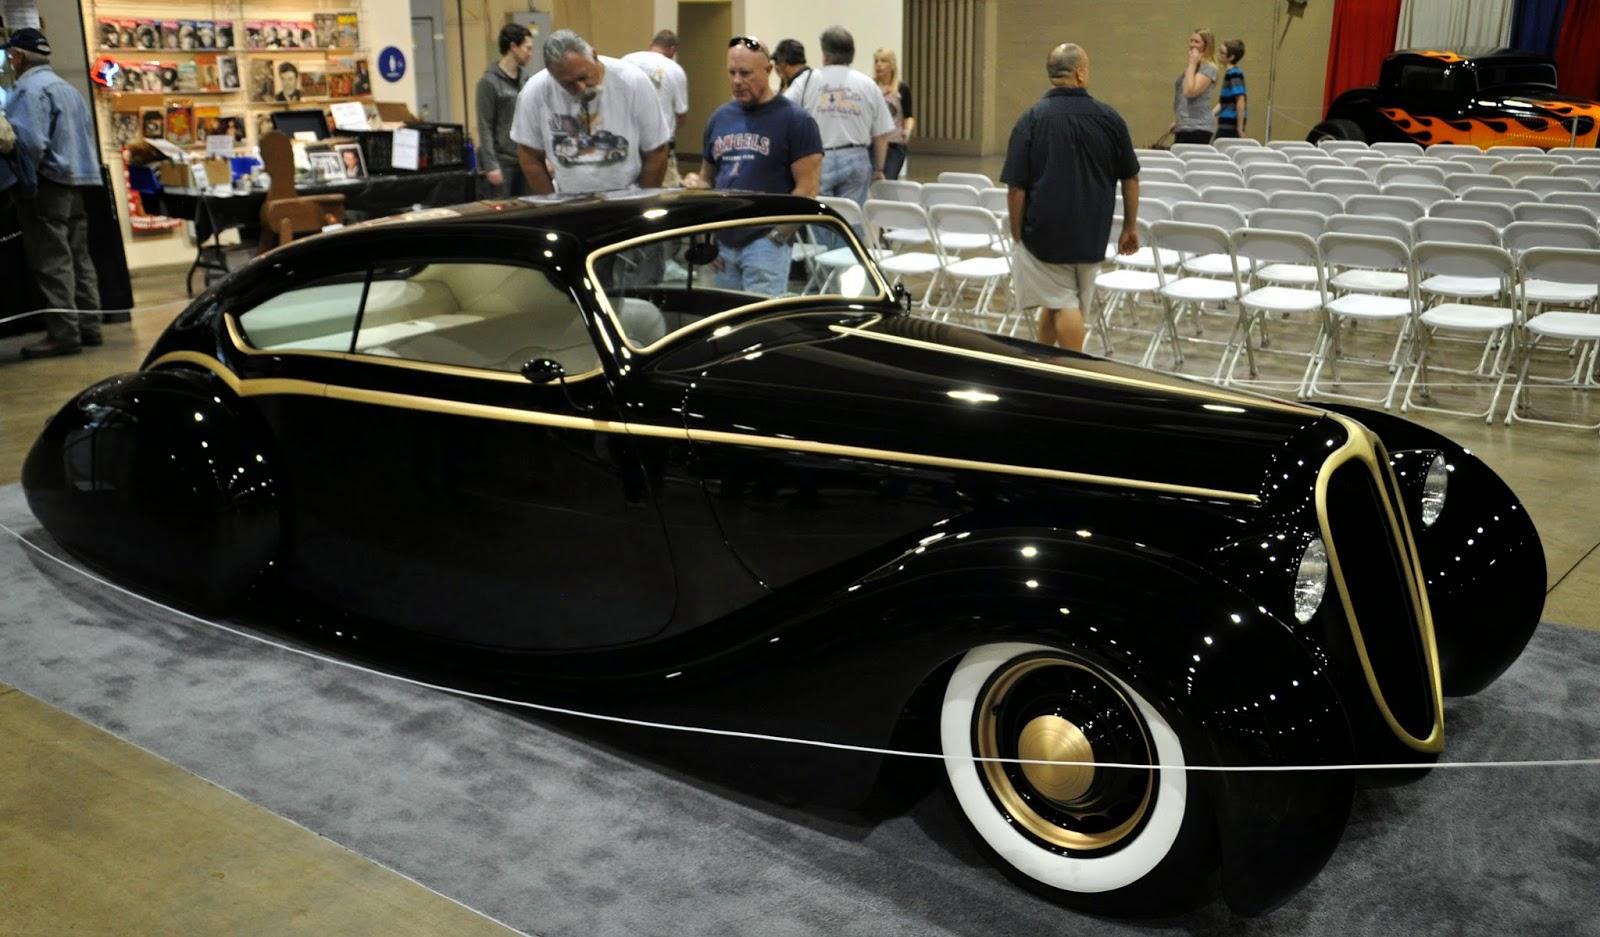 Hot Rod célèbres : 1948 Black Pearl  DSC_0219